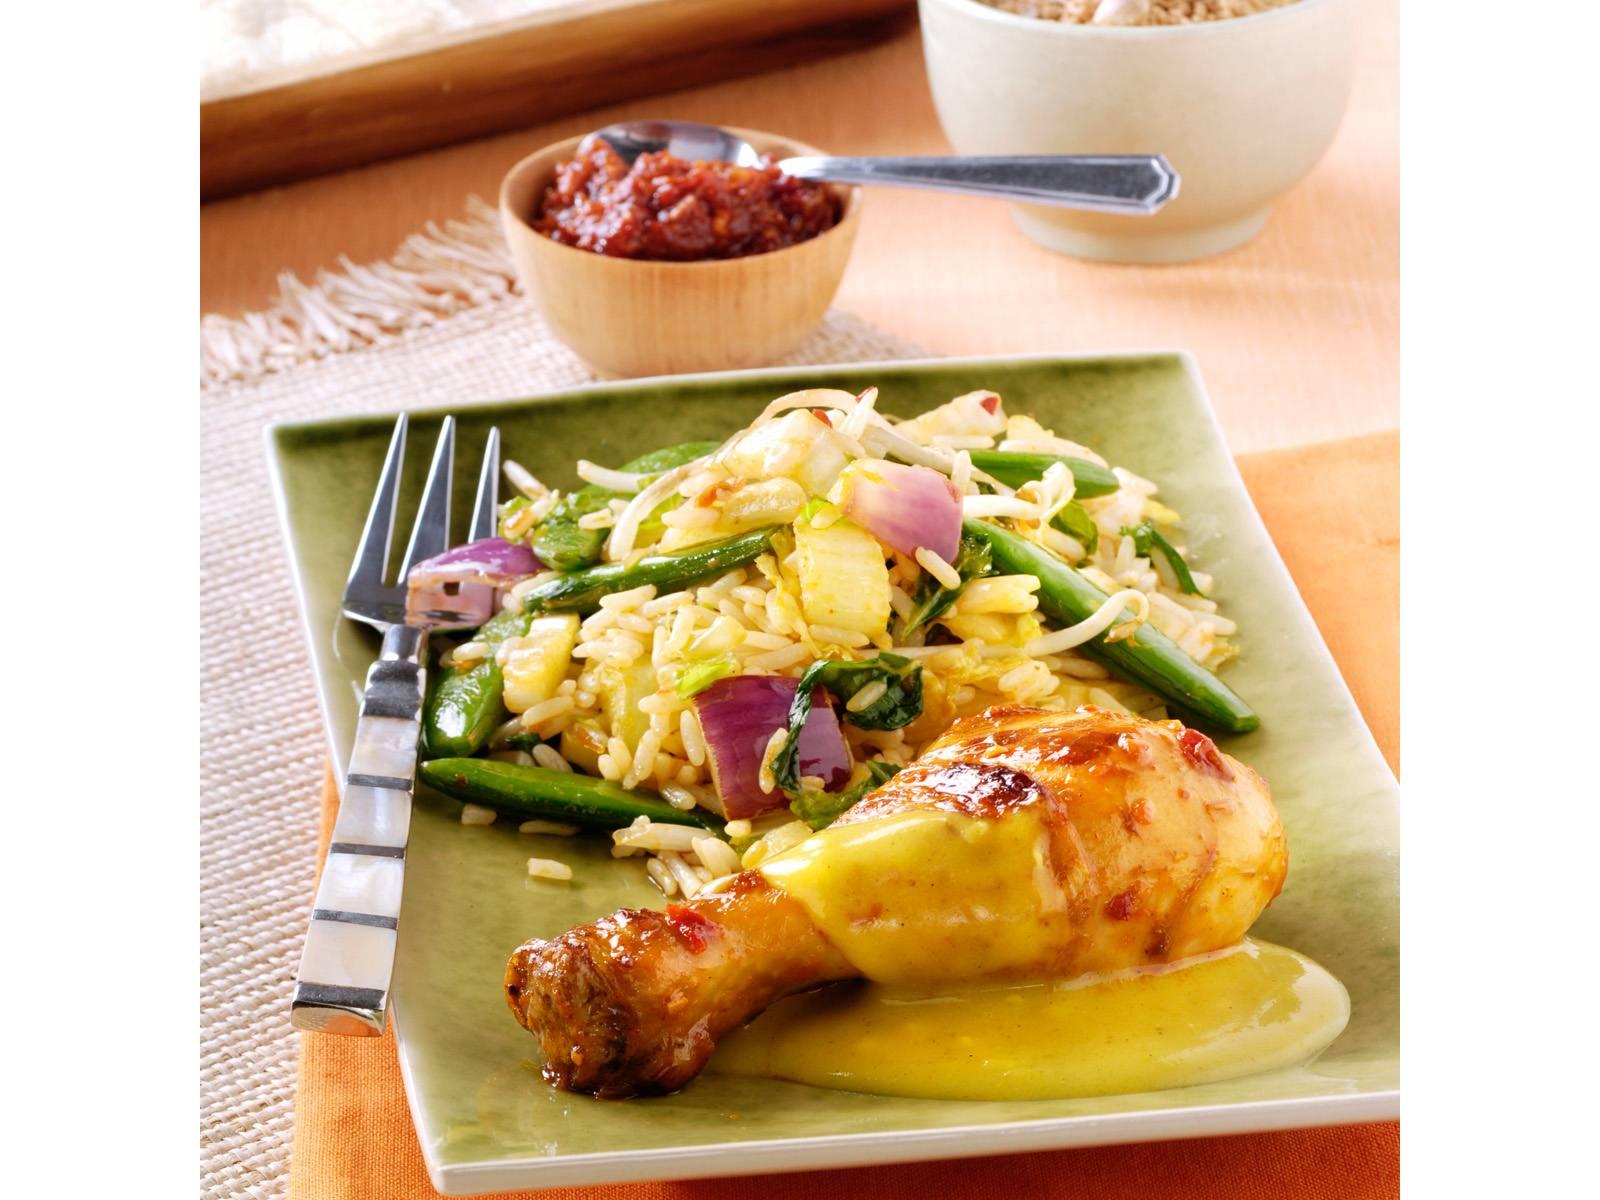 Sambaldrumsticks met kerriesaus en ketjap groentenasi